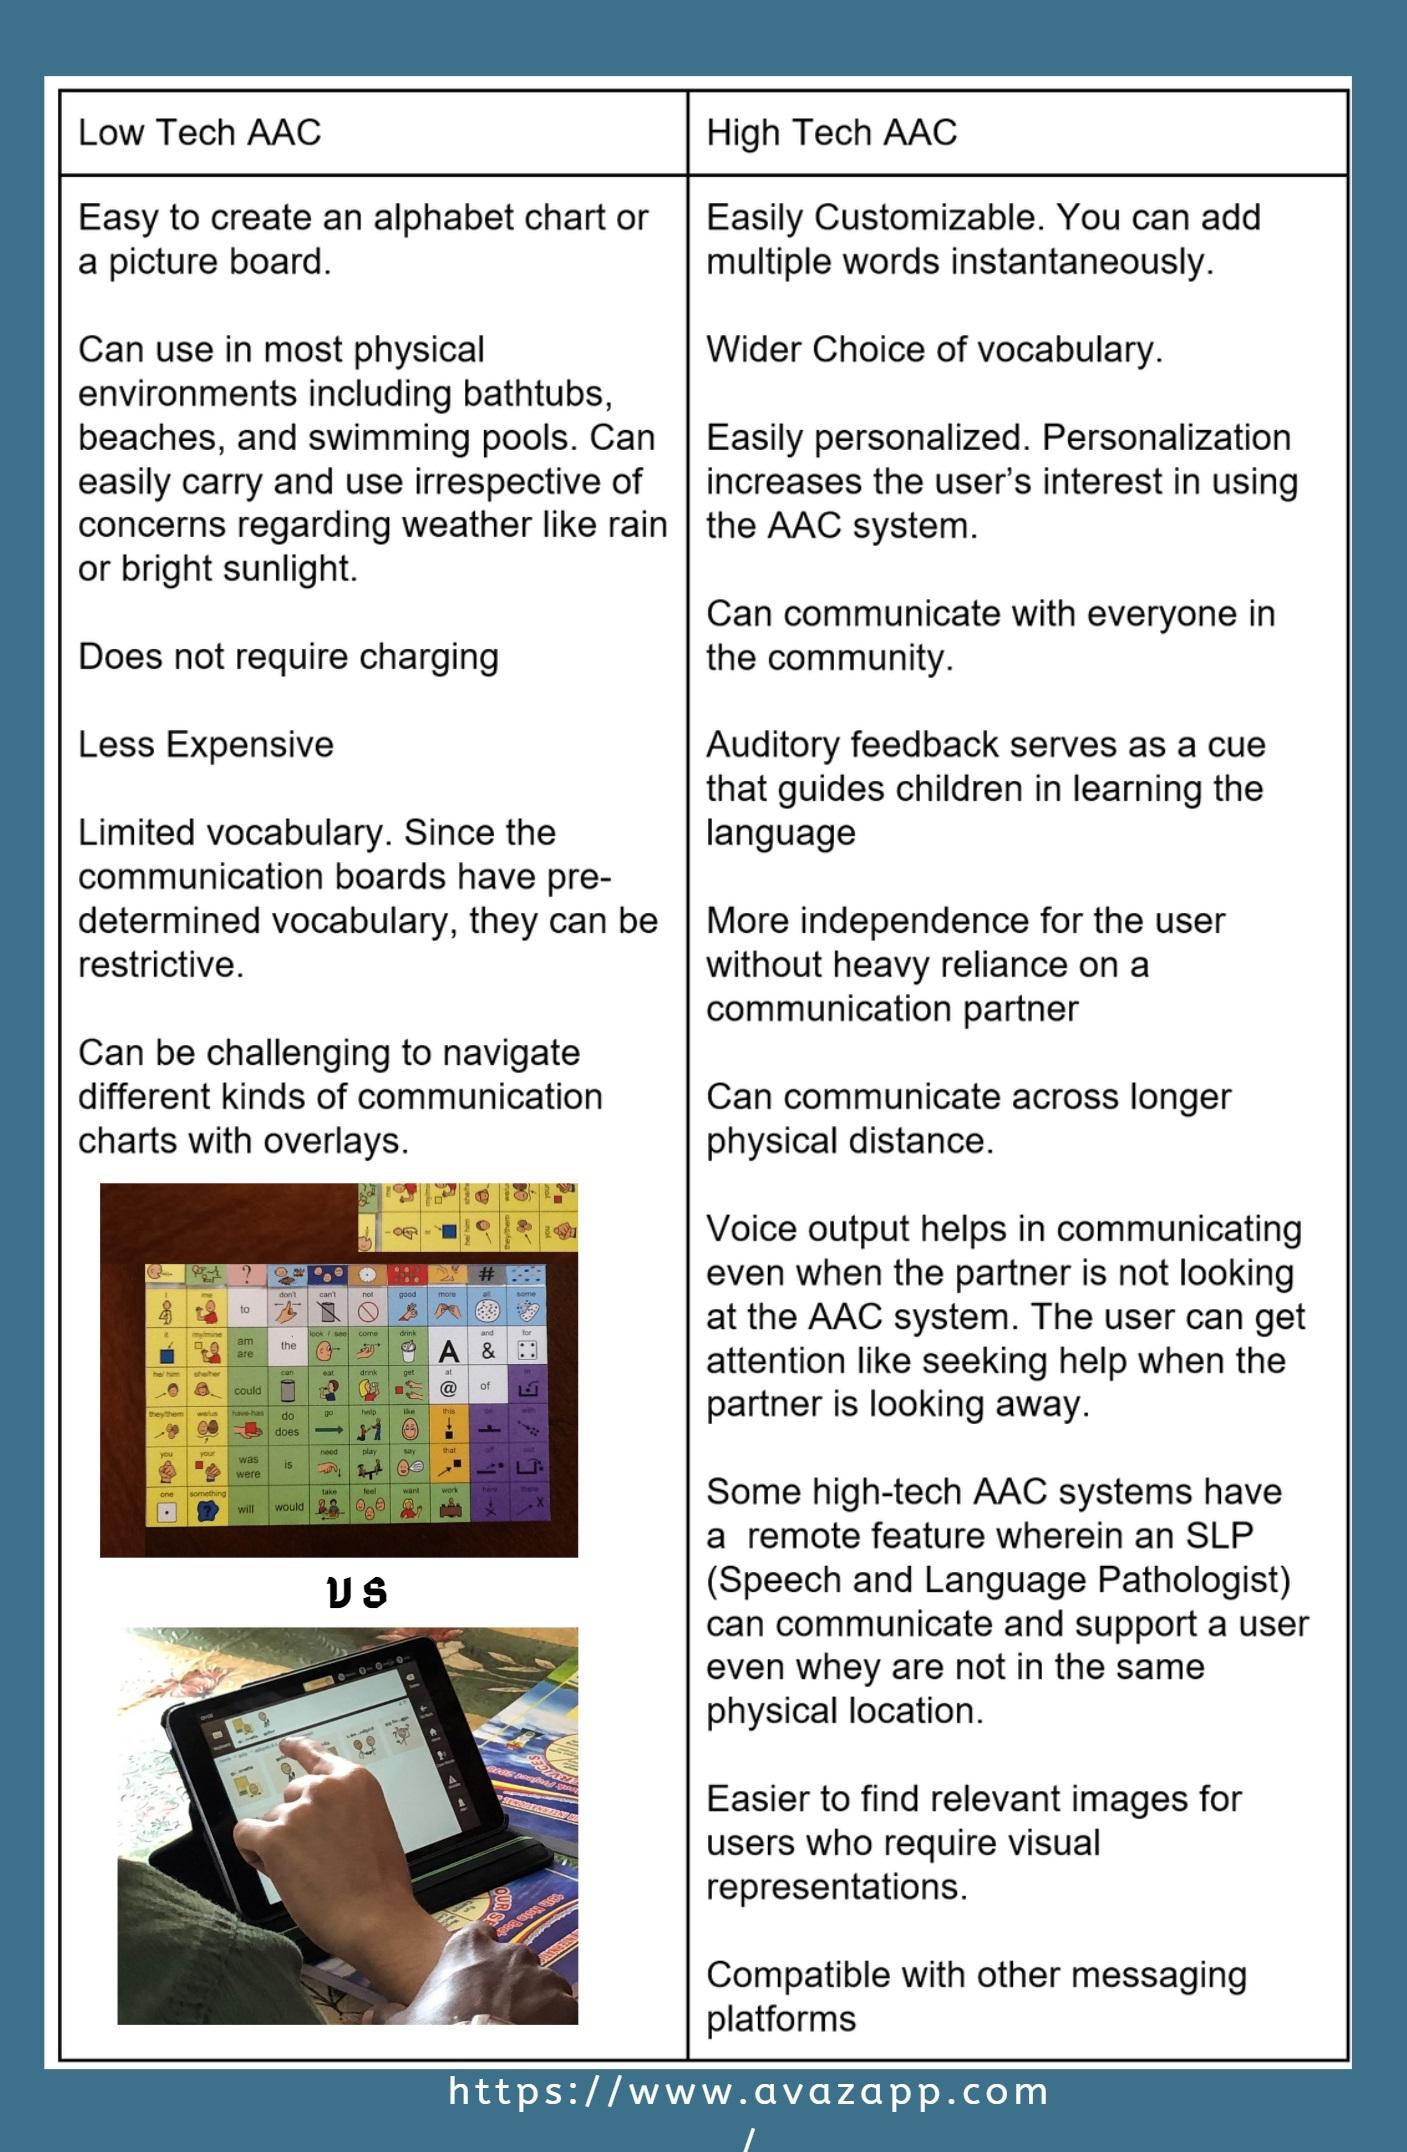 comparison of High tech Low-tech AAC